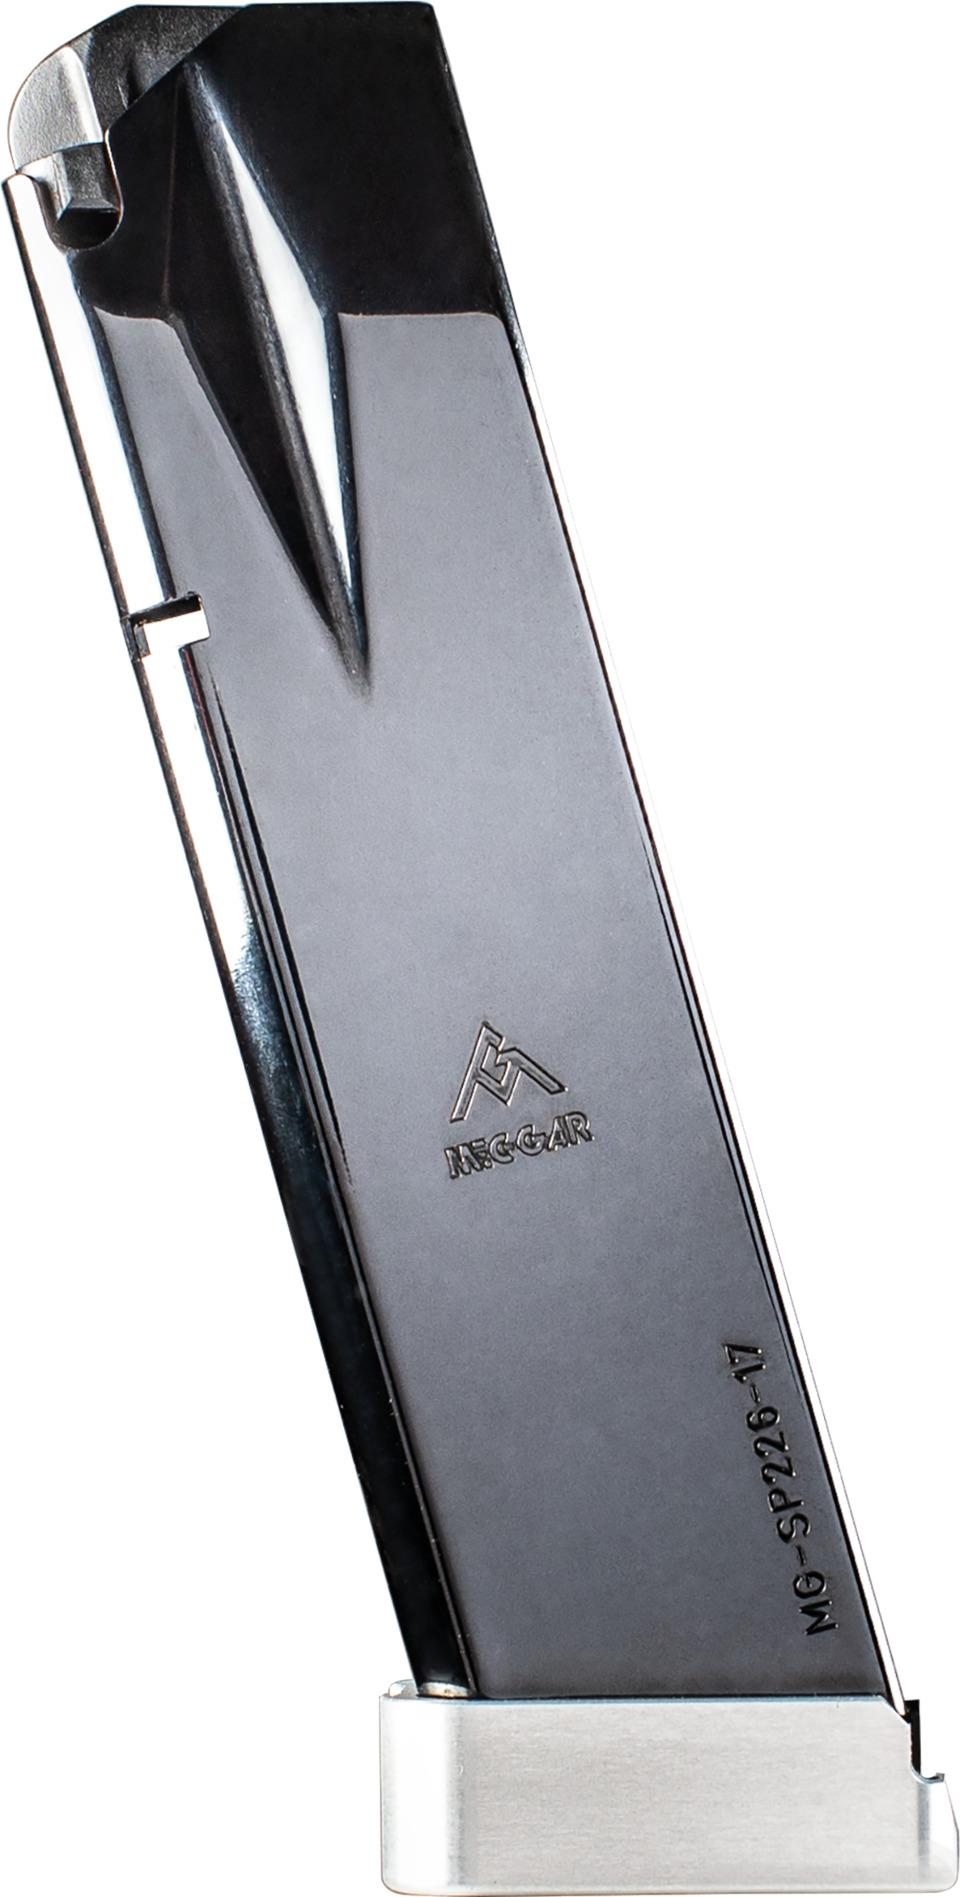 Mec-Gar® USA Announces New Sig Sauer 226 X5 9mm Magazines